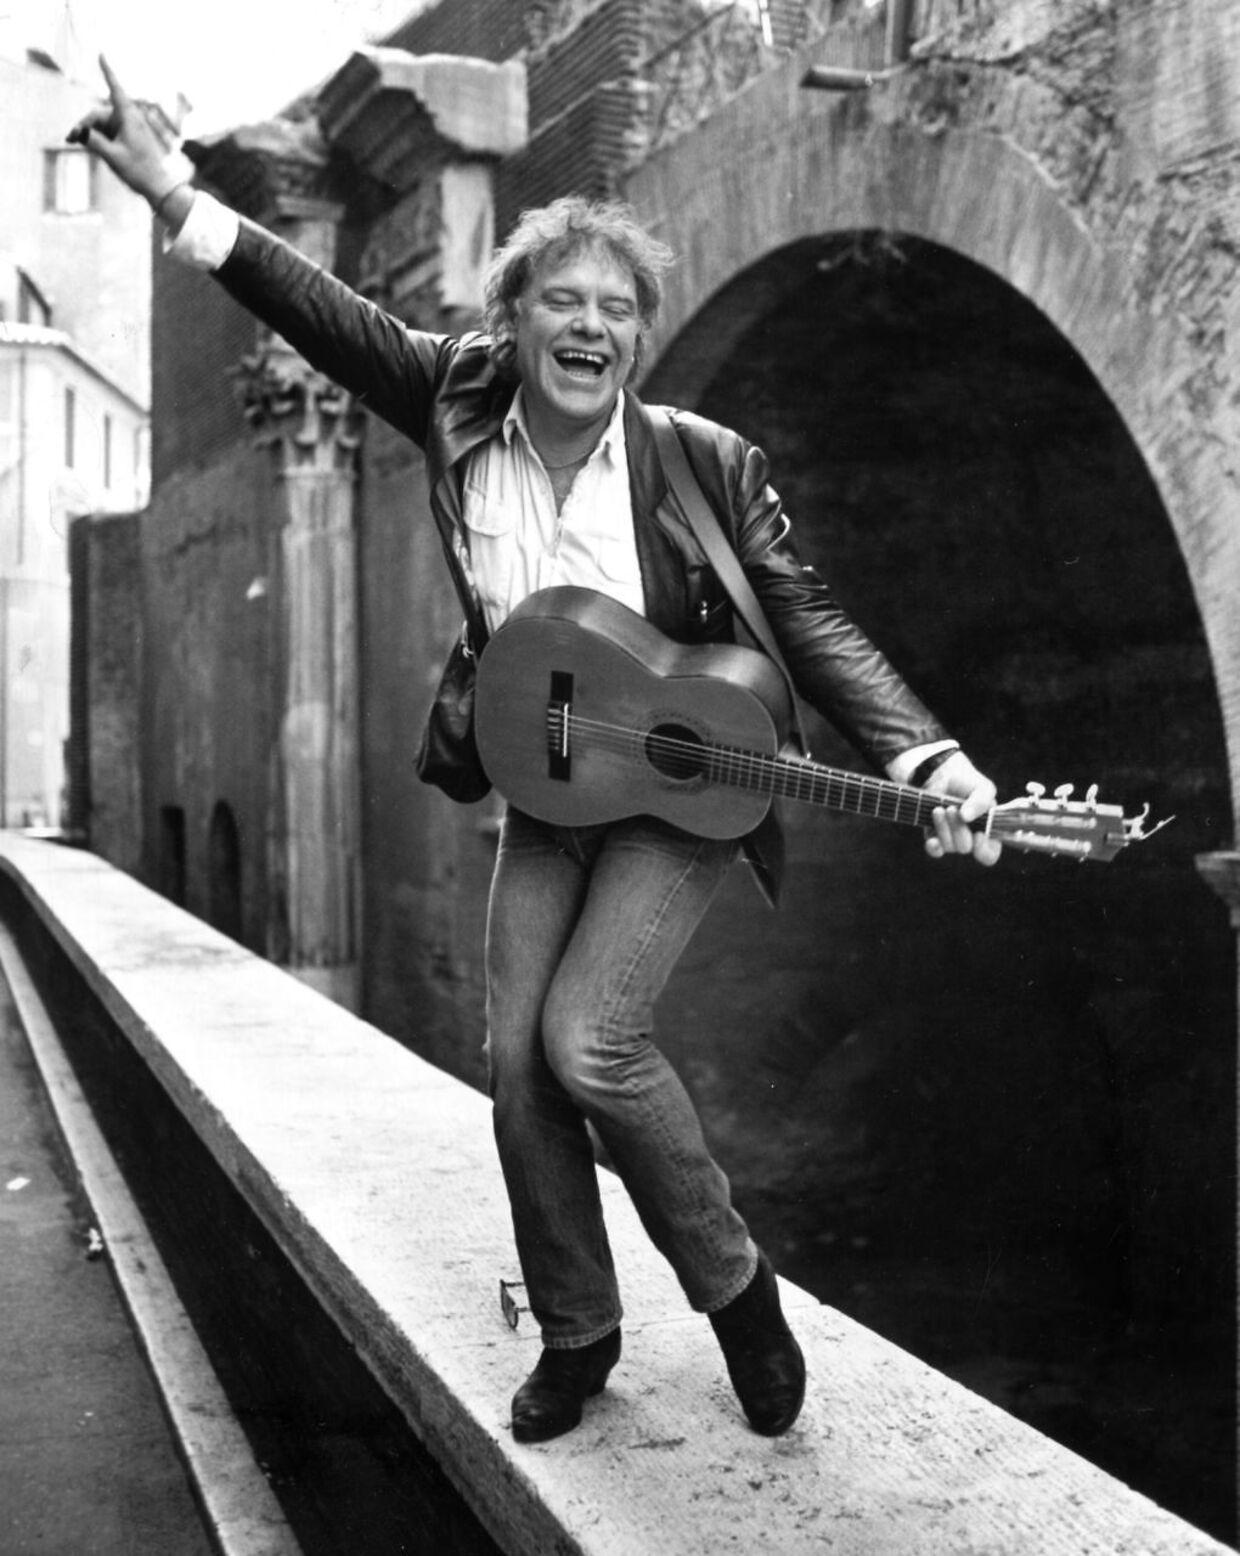 Kim Larsen, sanger, står på kanten af en bro i Rom og spiller guitar og synger.